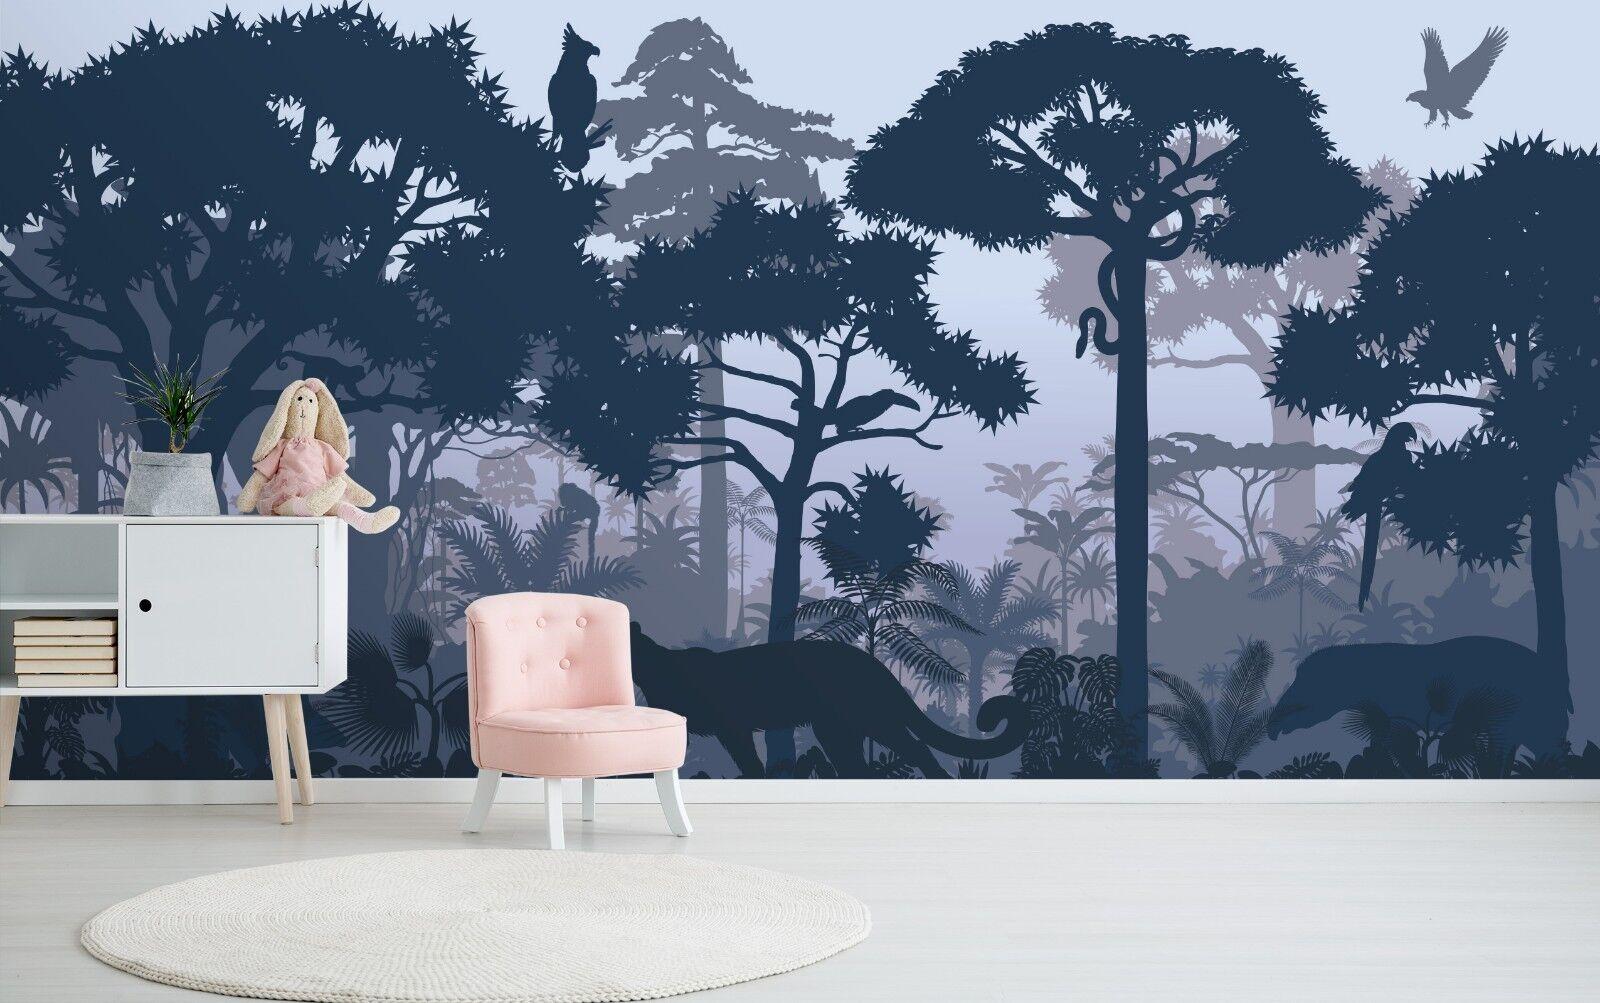 3D Nacht Wälder 5611 Textur Fliesen Marmor Tapeten Tapete Wandbild AJ